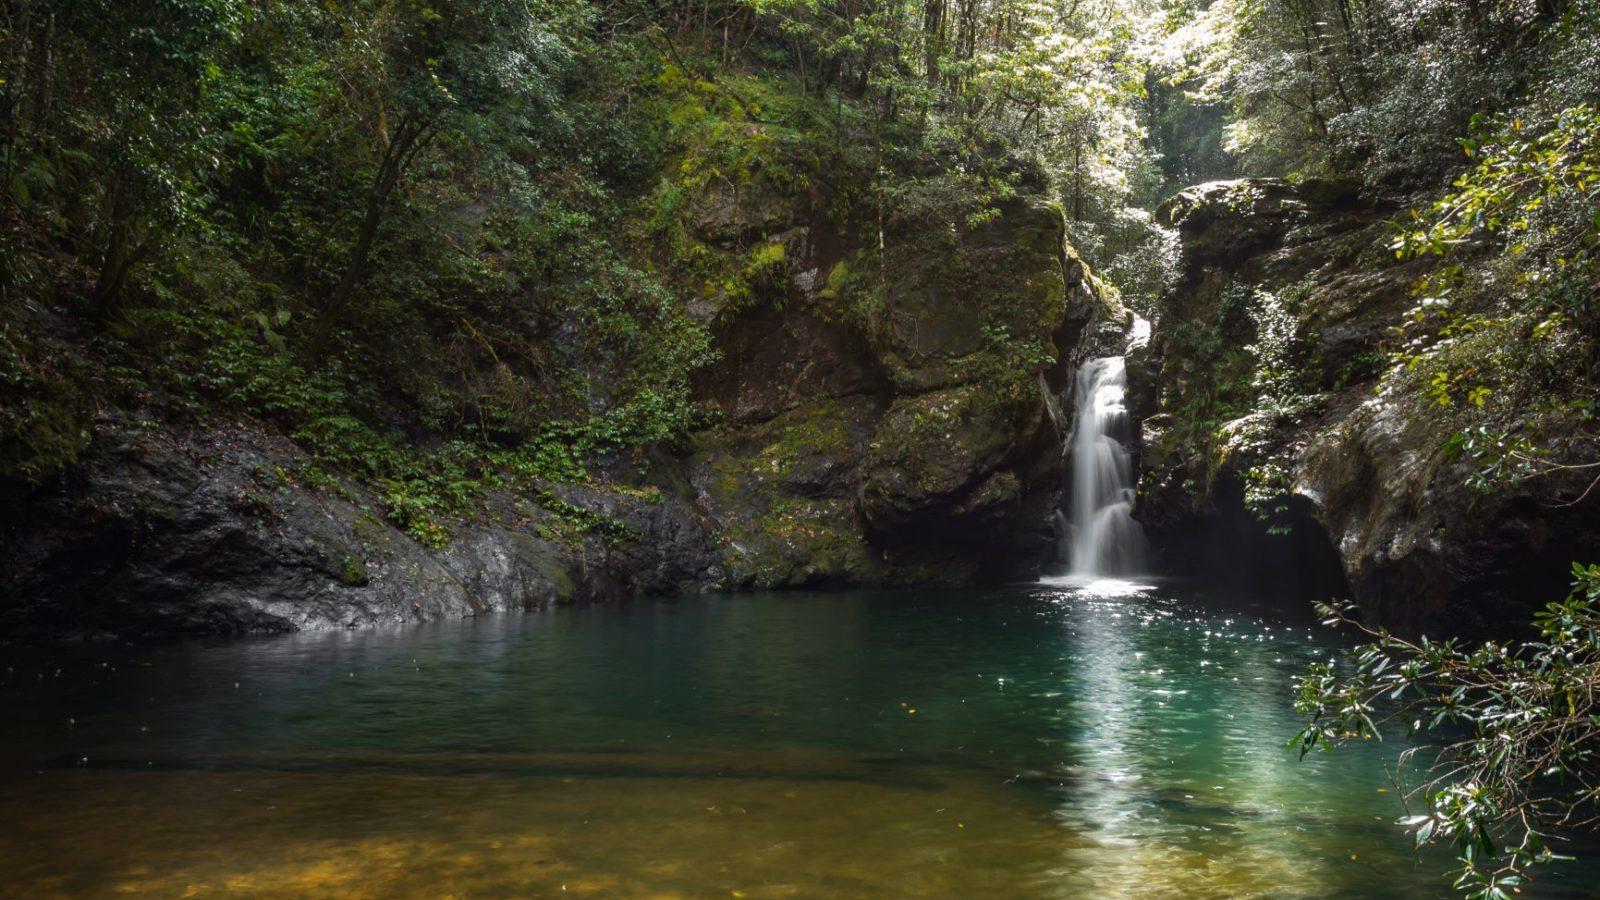 Potaroo Falls, Tapin Tops National Park, clear fresh water falls